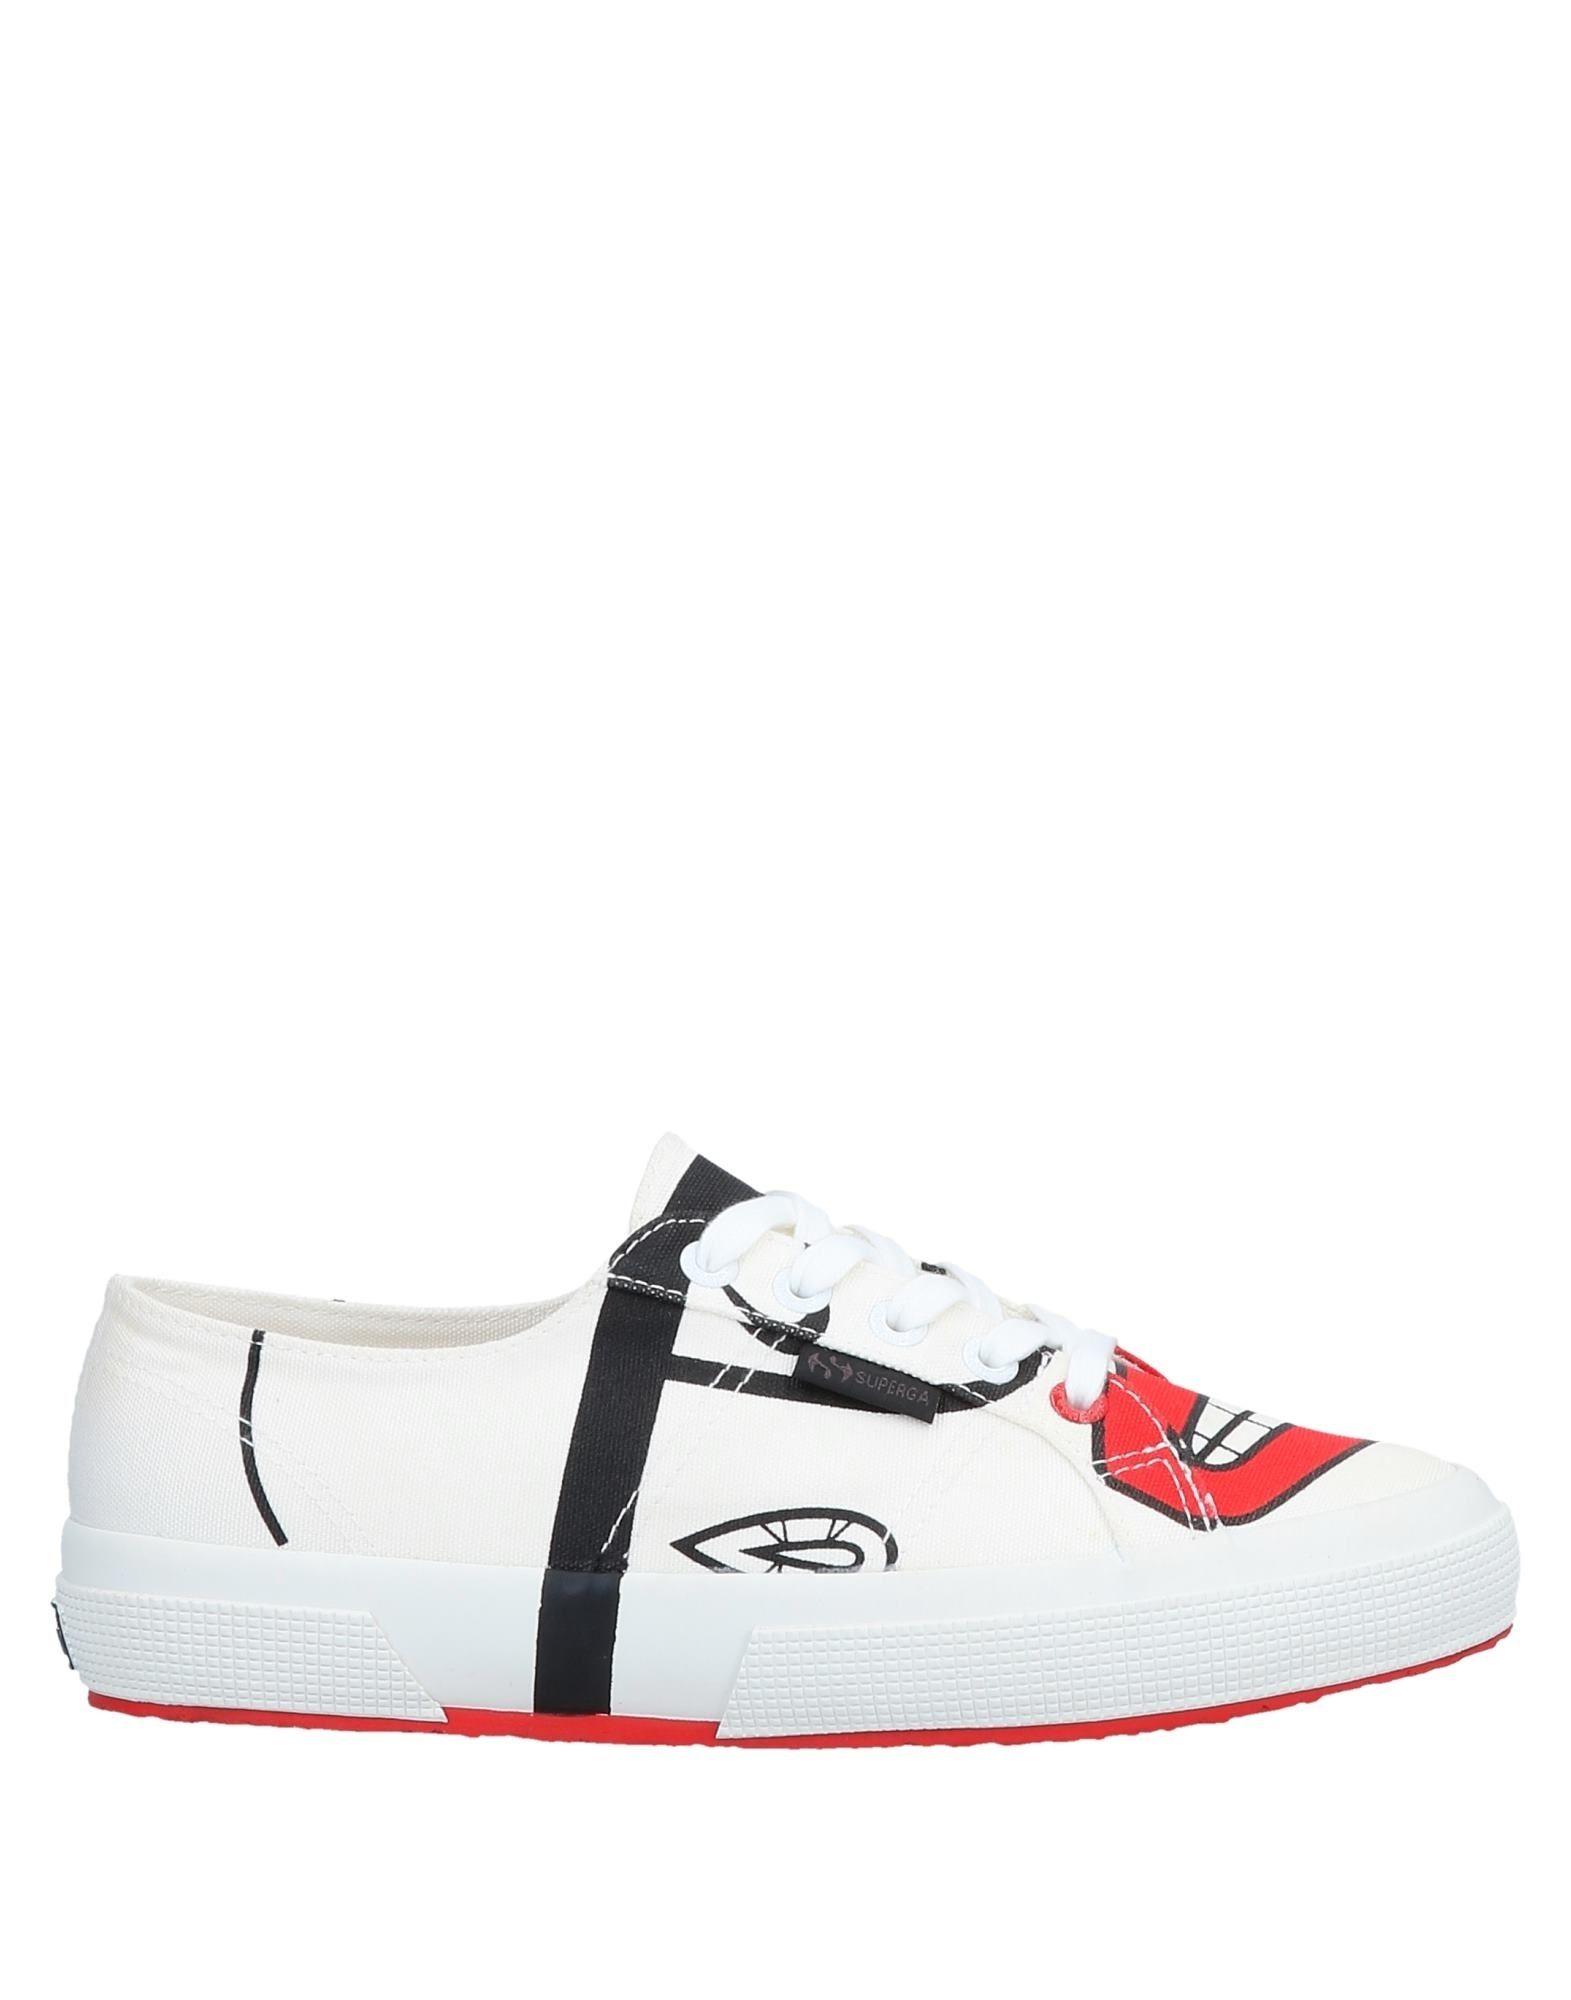 Zapatillas Superga® Mujer - Zapatillas Superga® Superga® Zapatillas  Blanco c8c59b